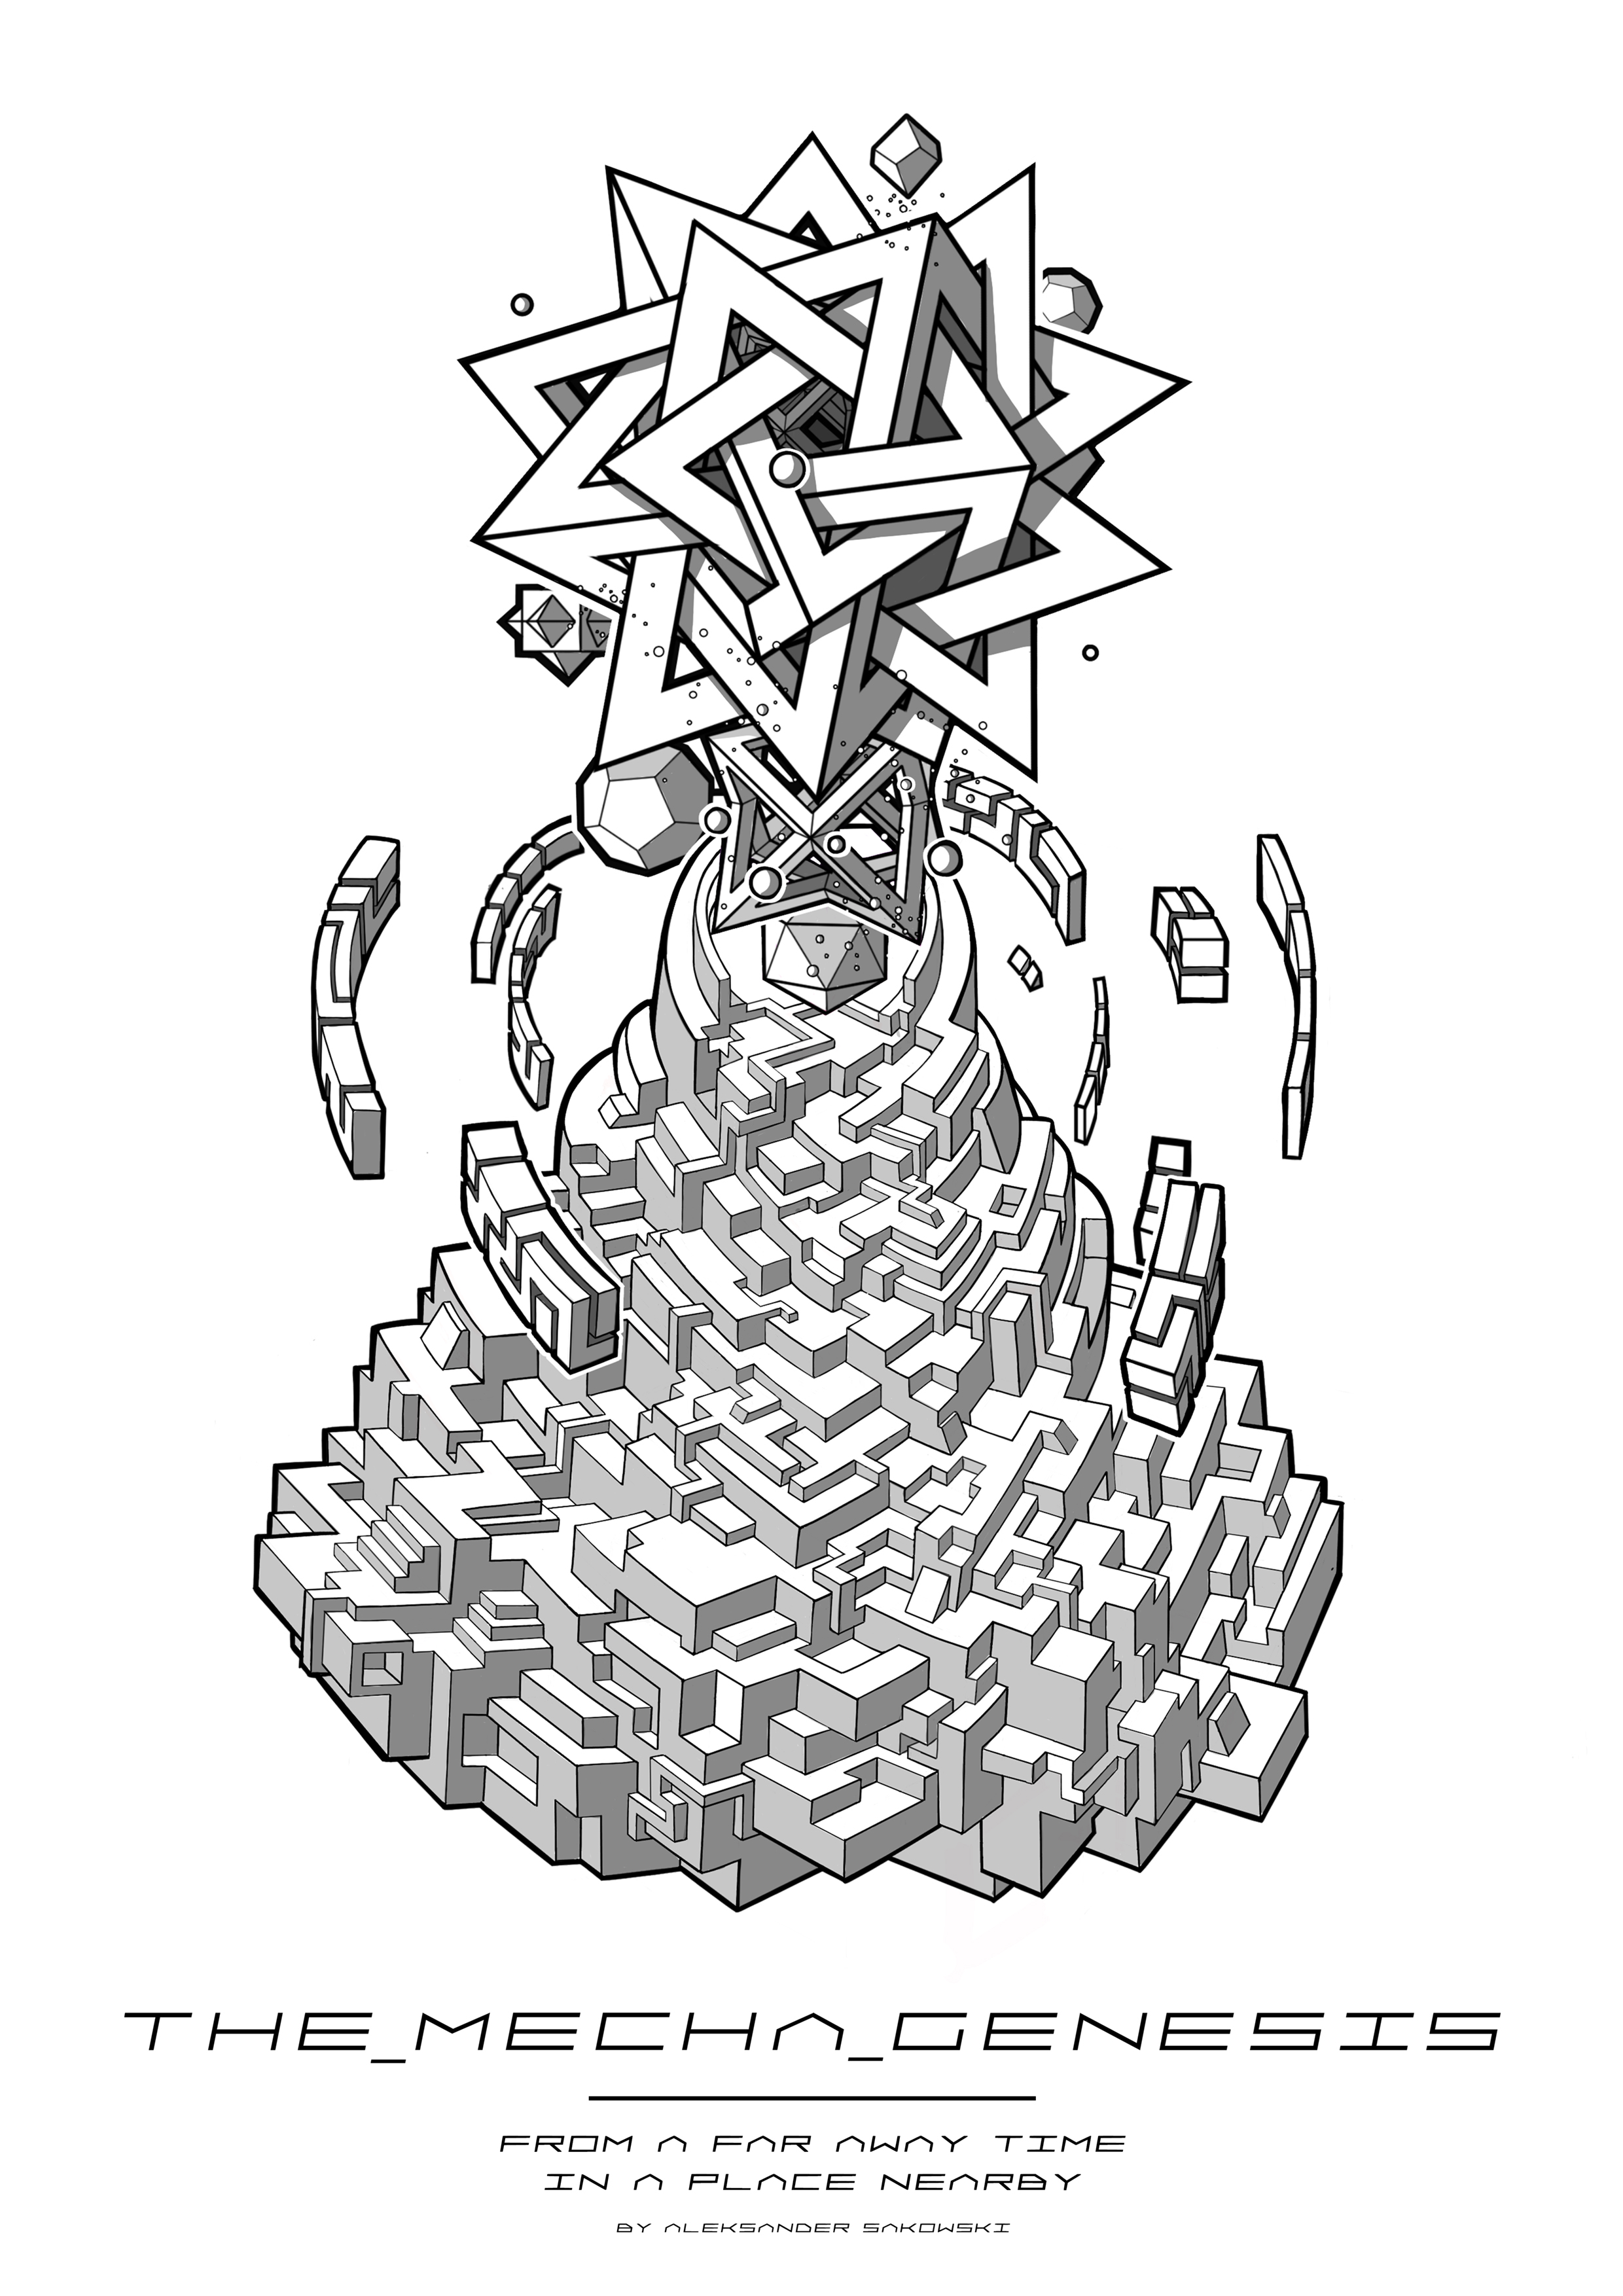 Manhedron